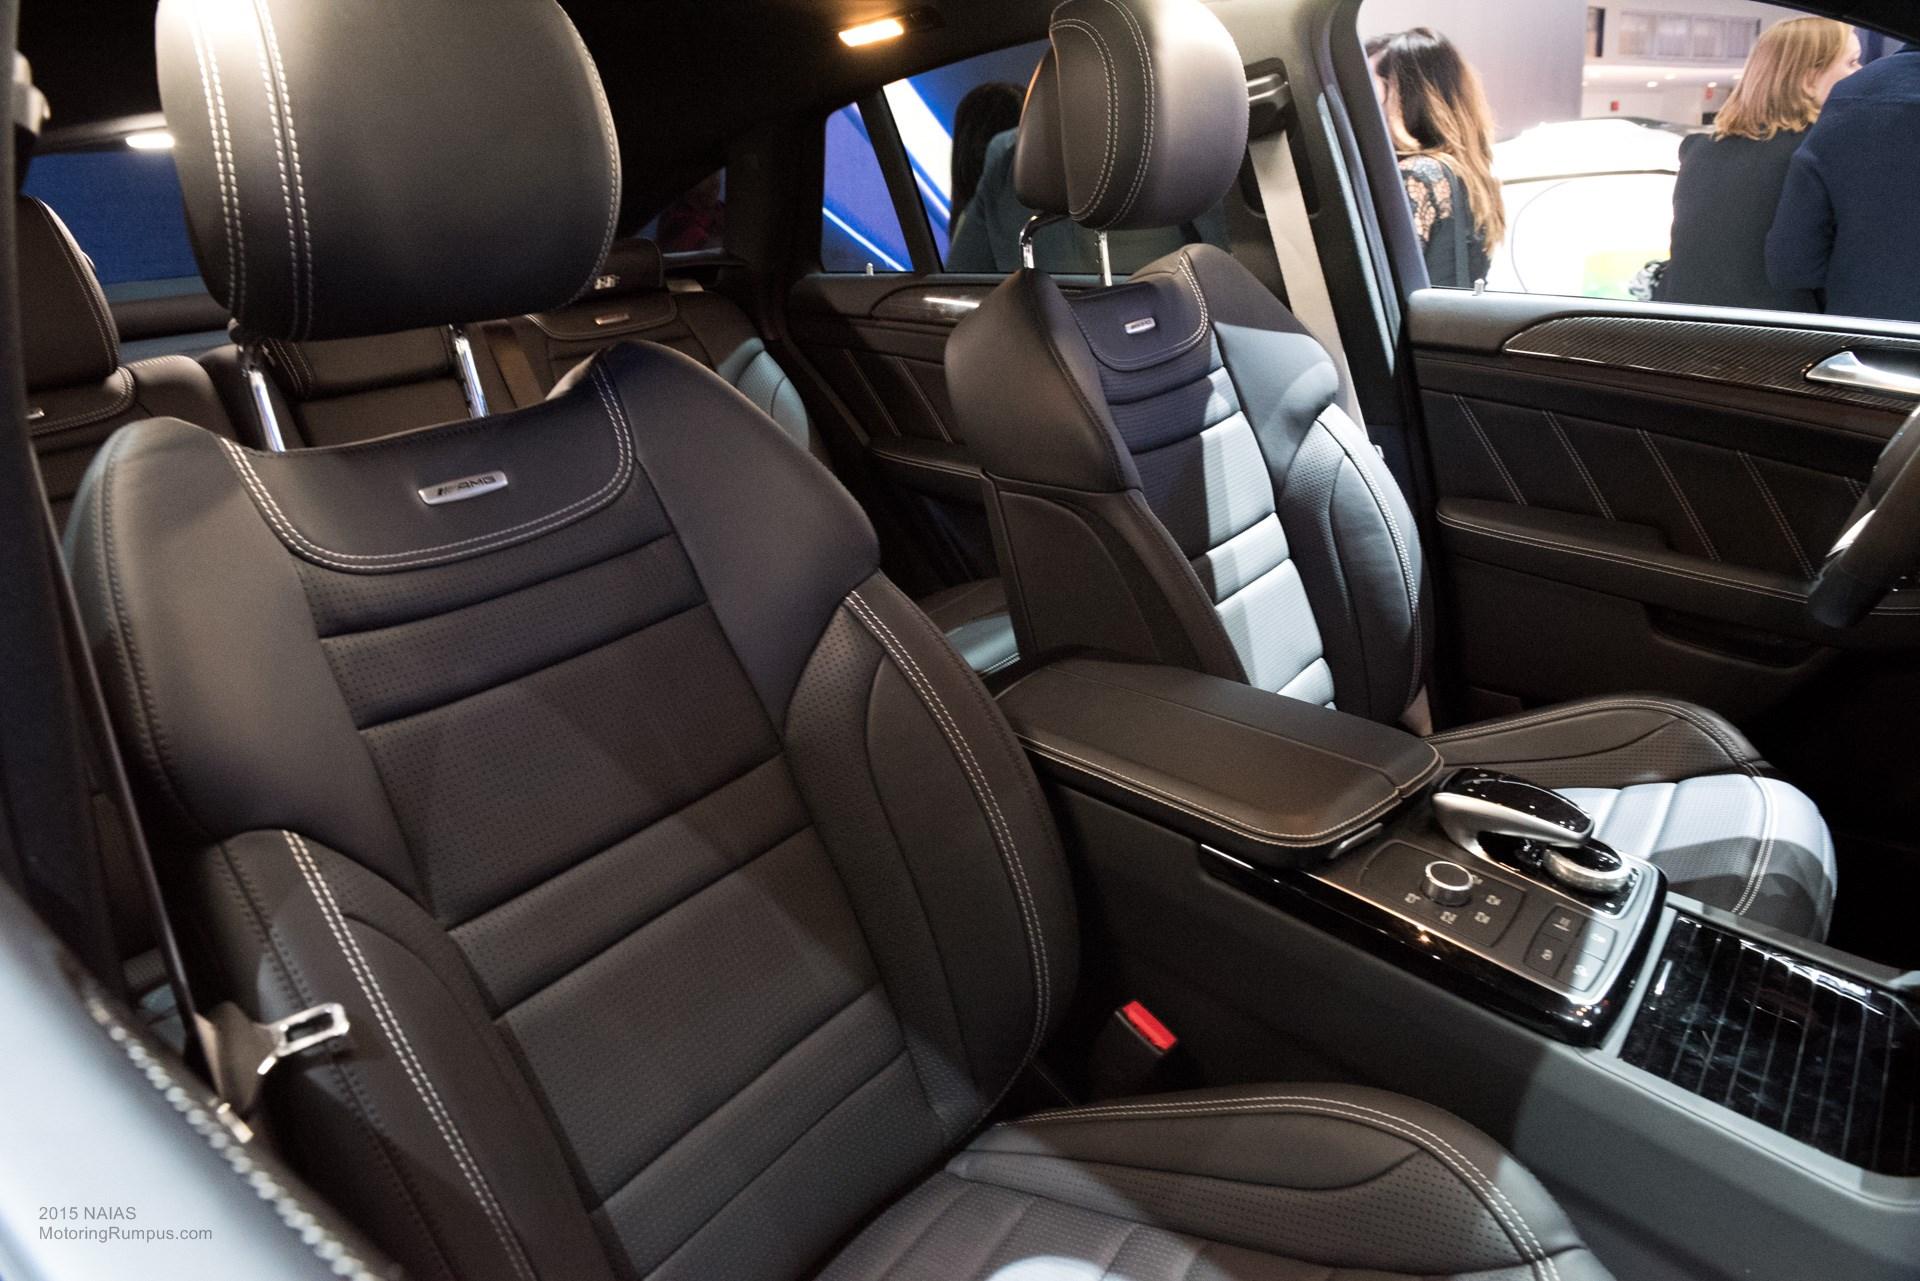 Mercedes-AMG GLE 63 S Seats